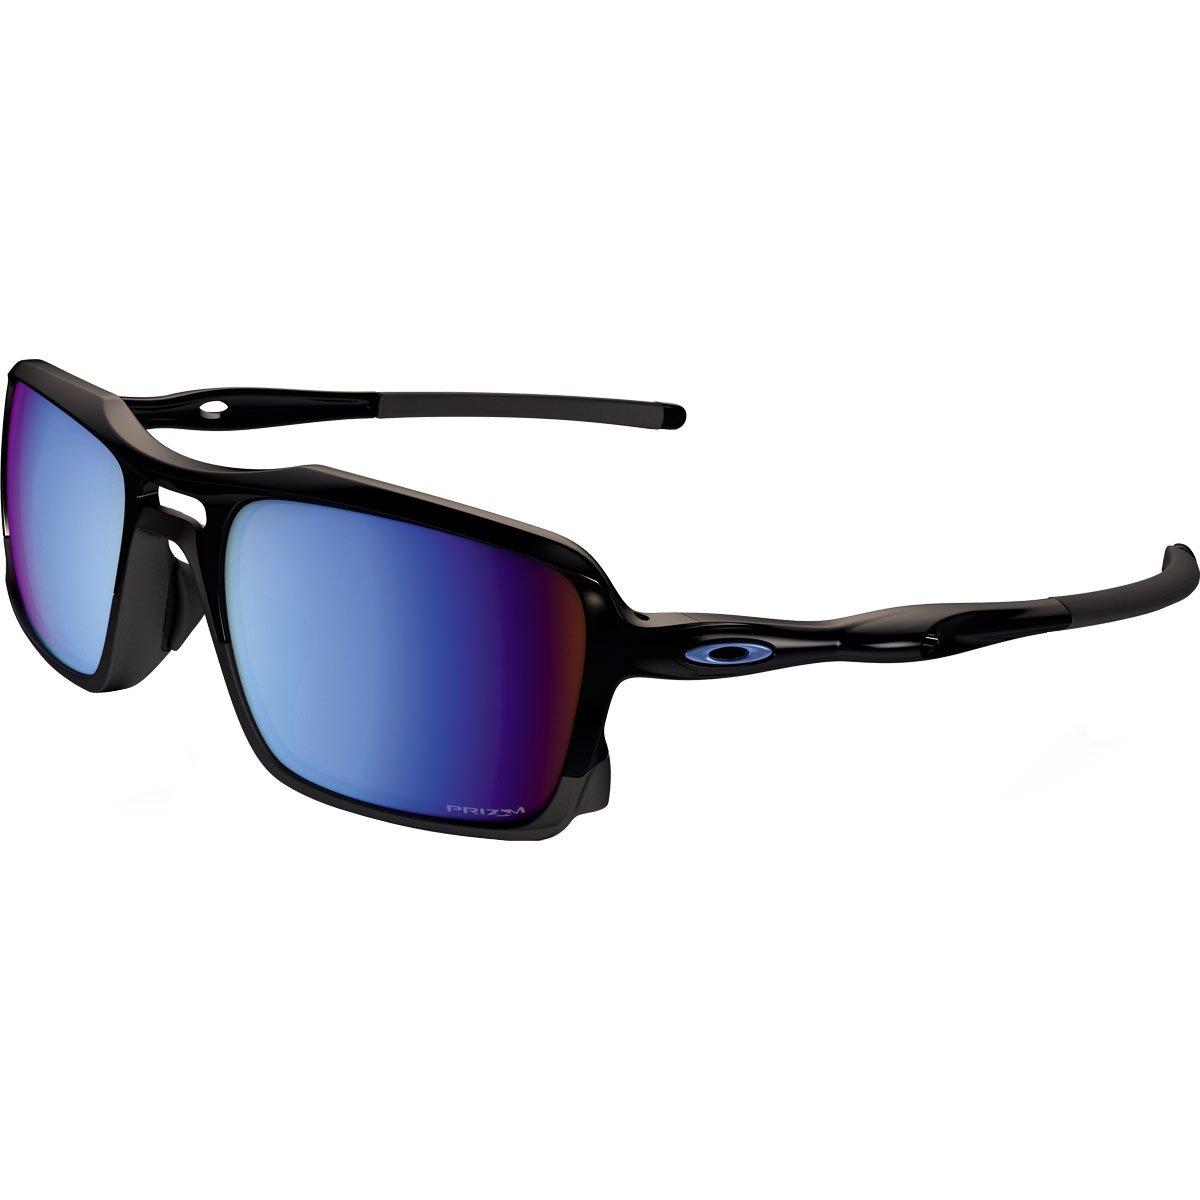 Oakley Mens Triggerman Polarized Sunglasses, Polished Black/Prizm Deep Water, One Size